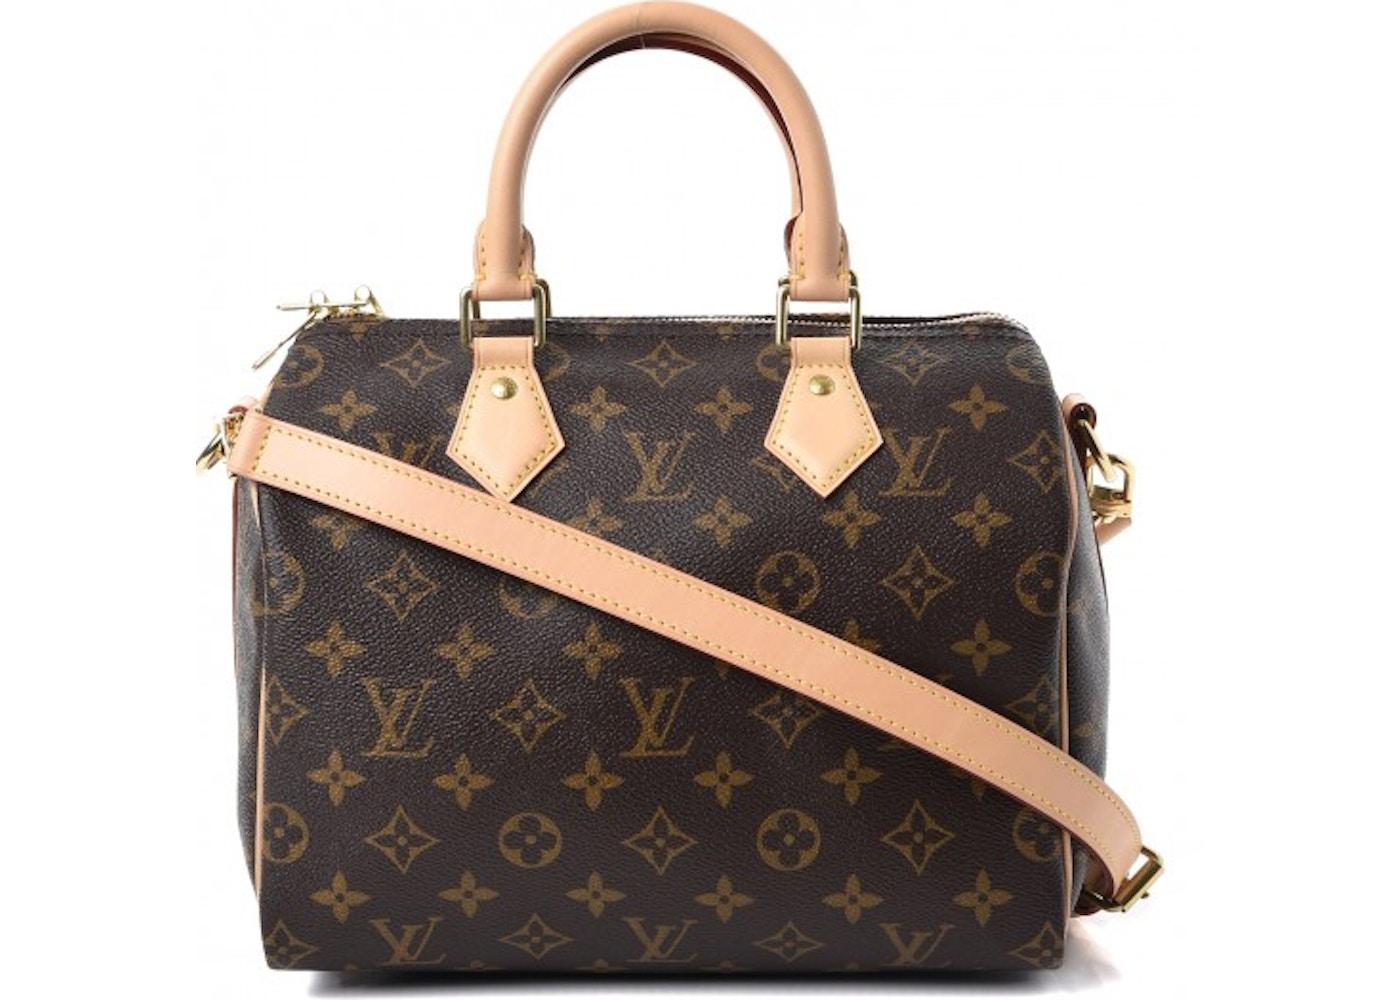 4cc251f09561 Louis Vuitton Speedy Bandouliere Monogram With Accessories 25 ...